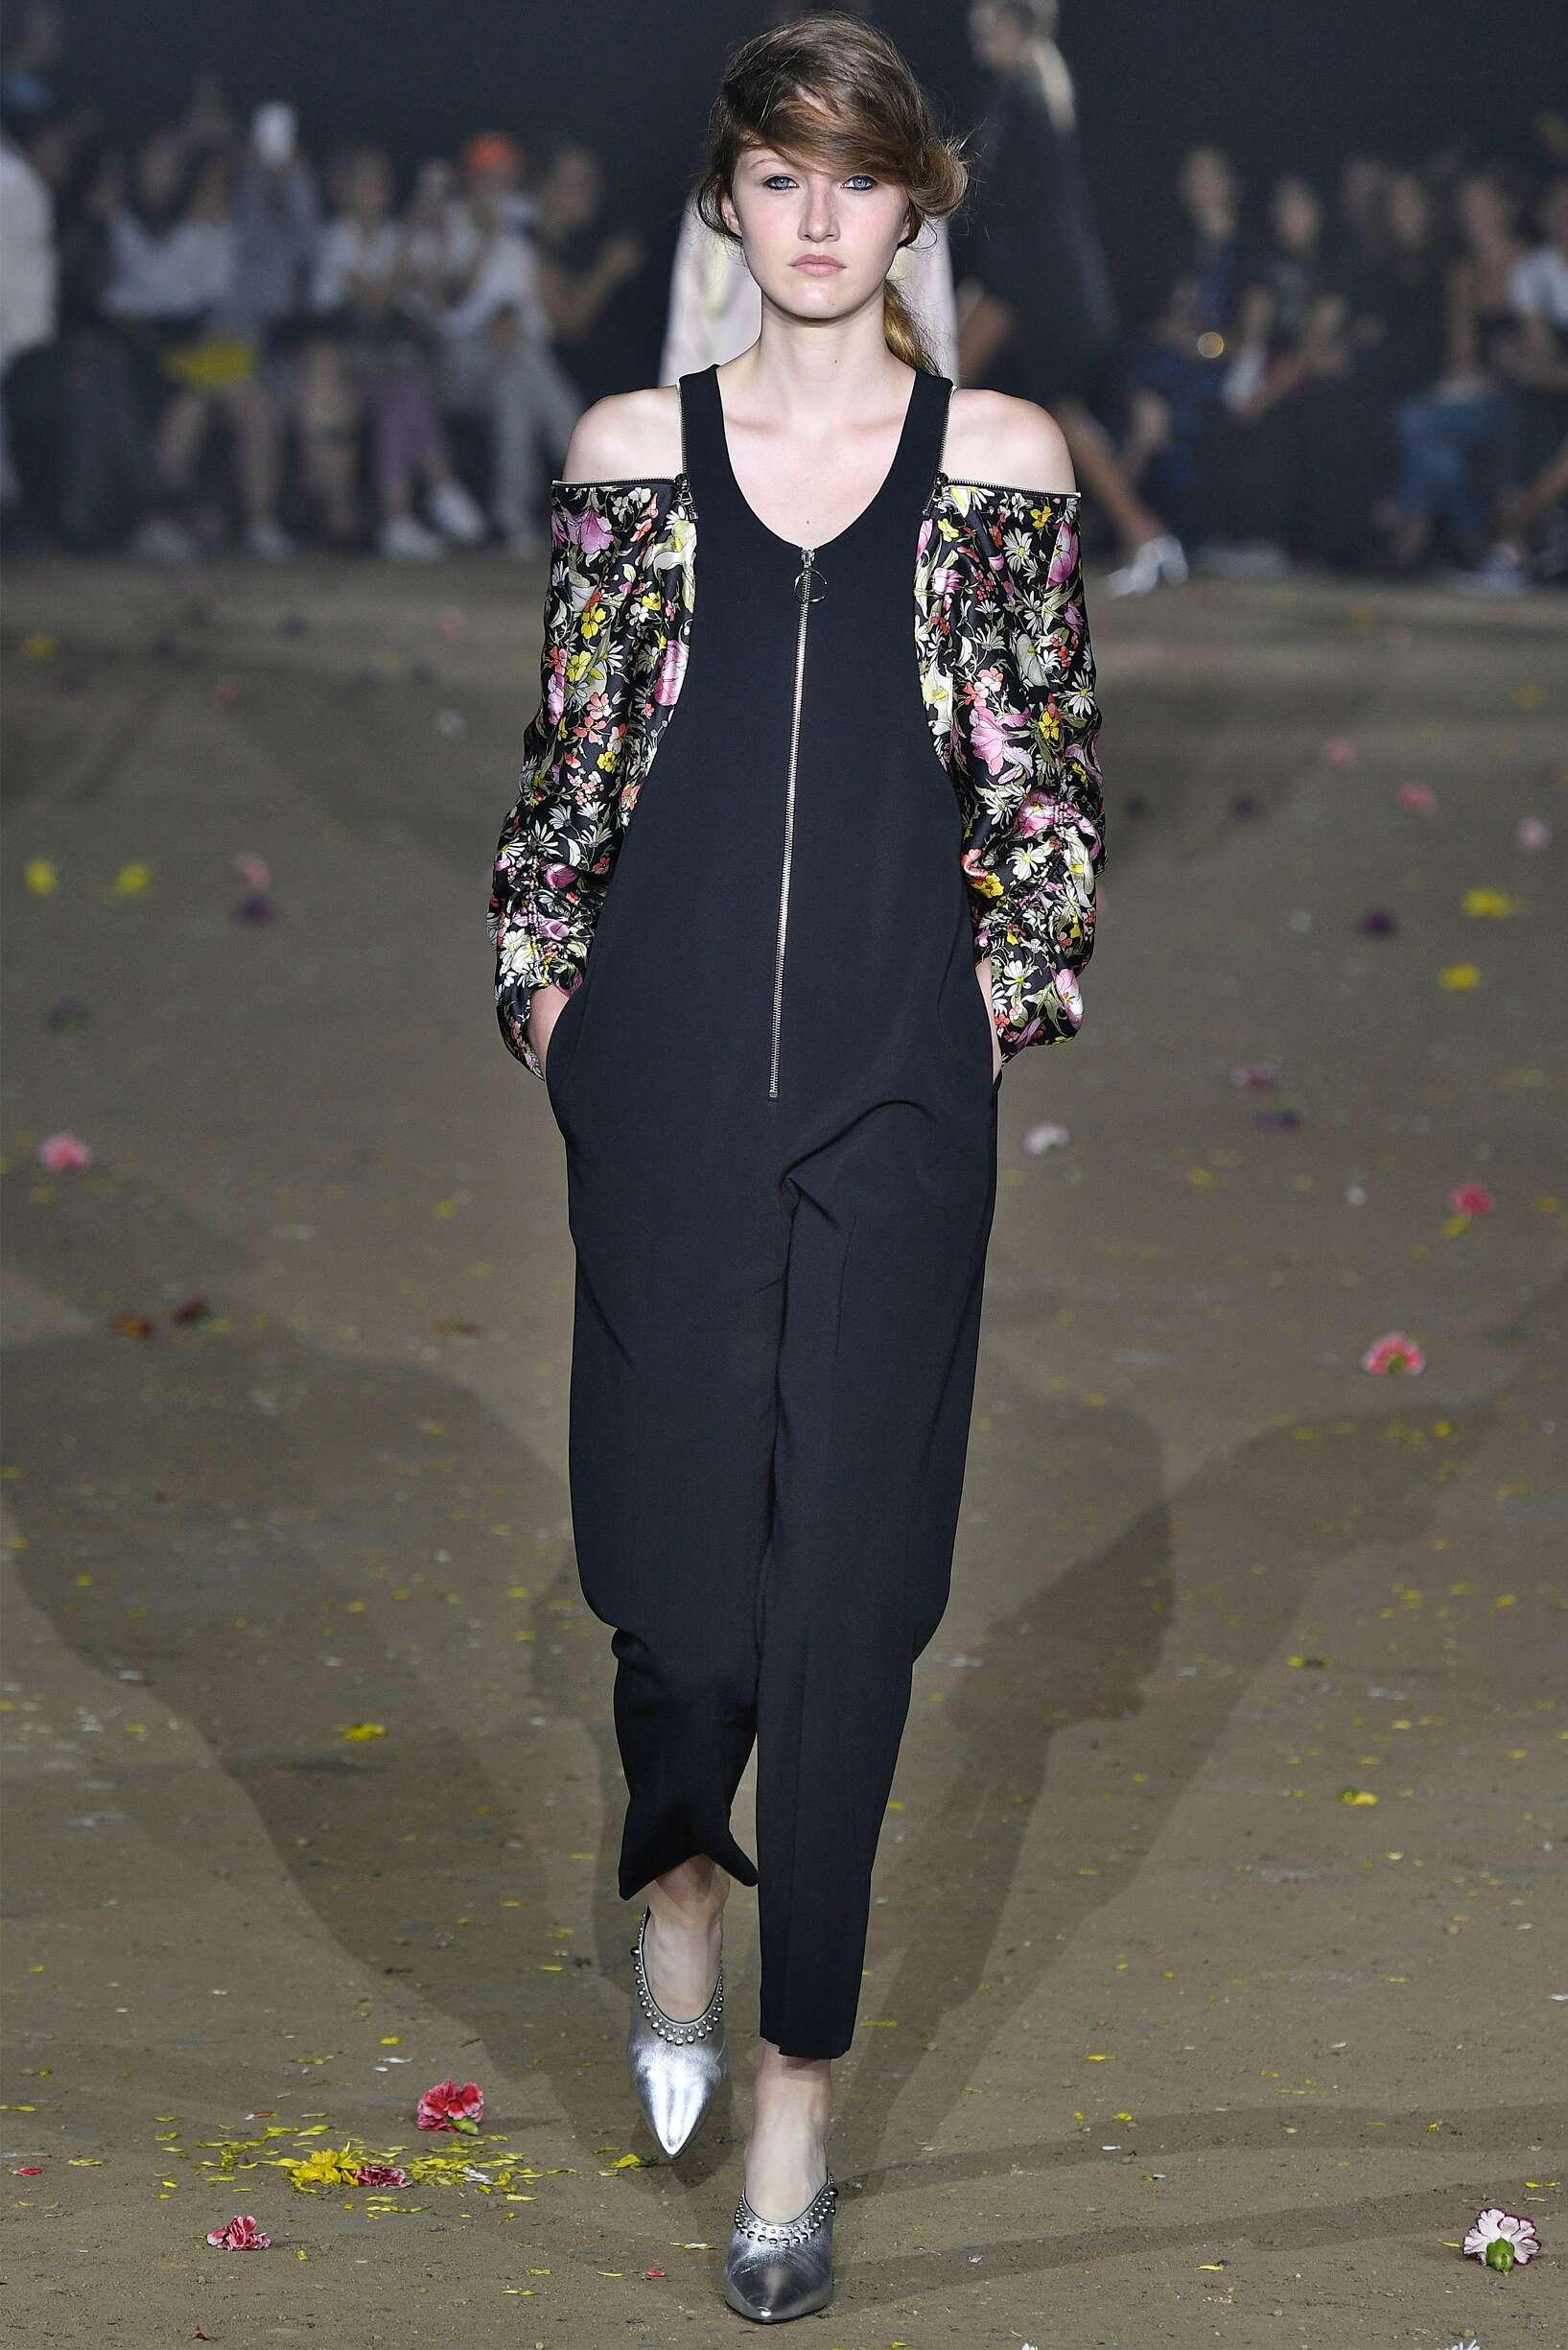 Fashion Model 3.1 Phillip Lim Catwalk